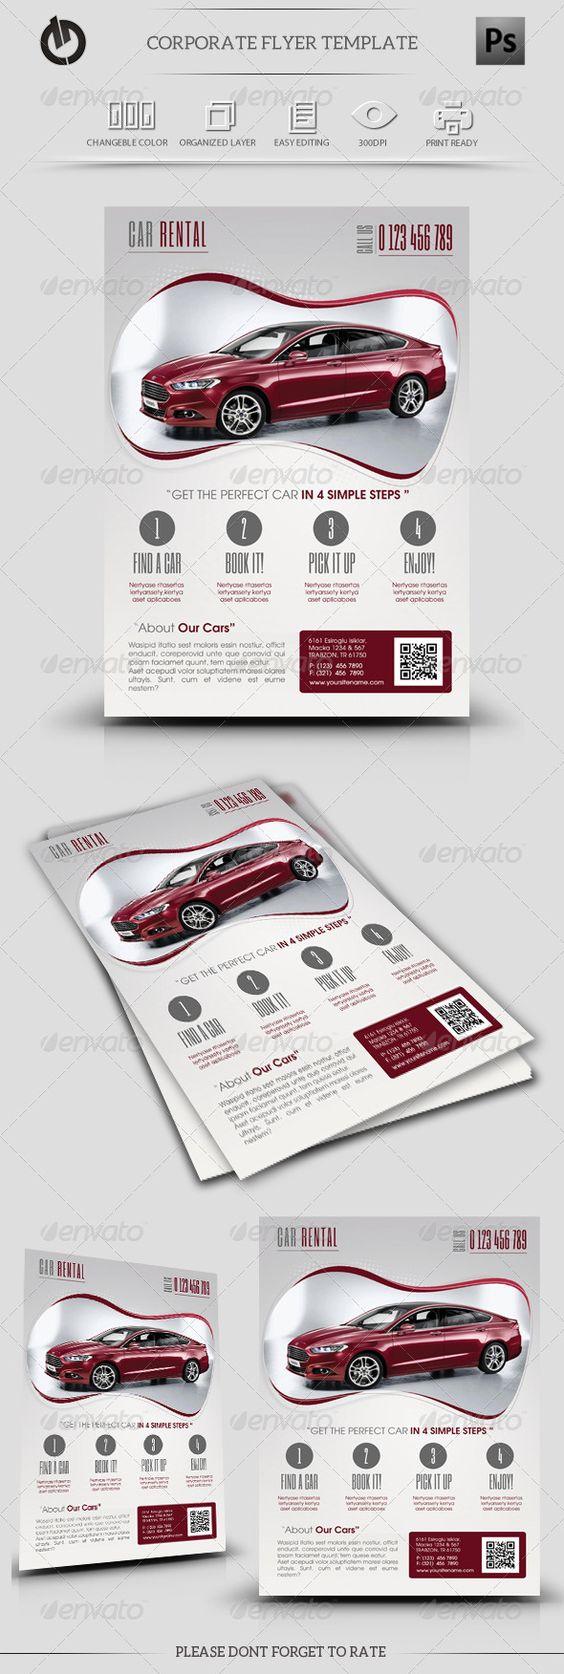 Car Rental Flyer Template  Graphicriver Car Rental Flyer